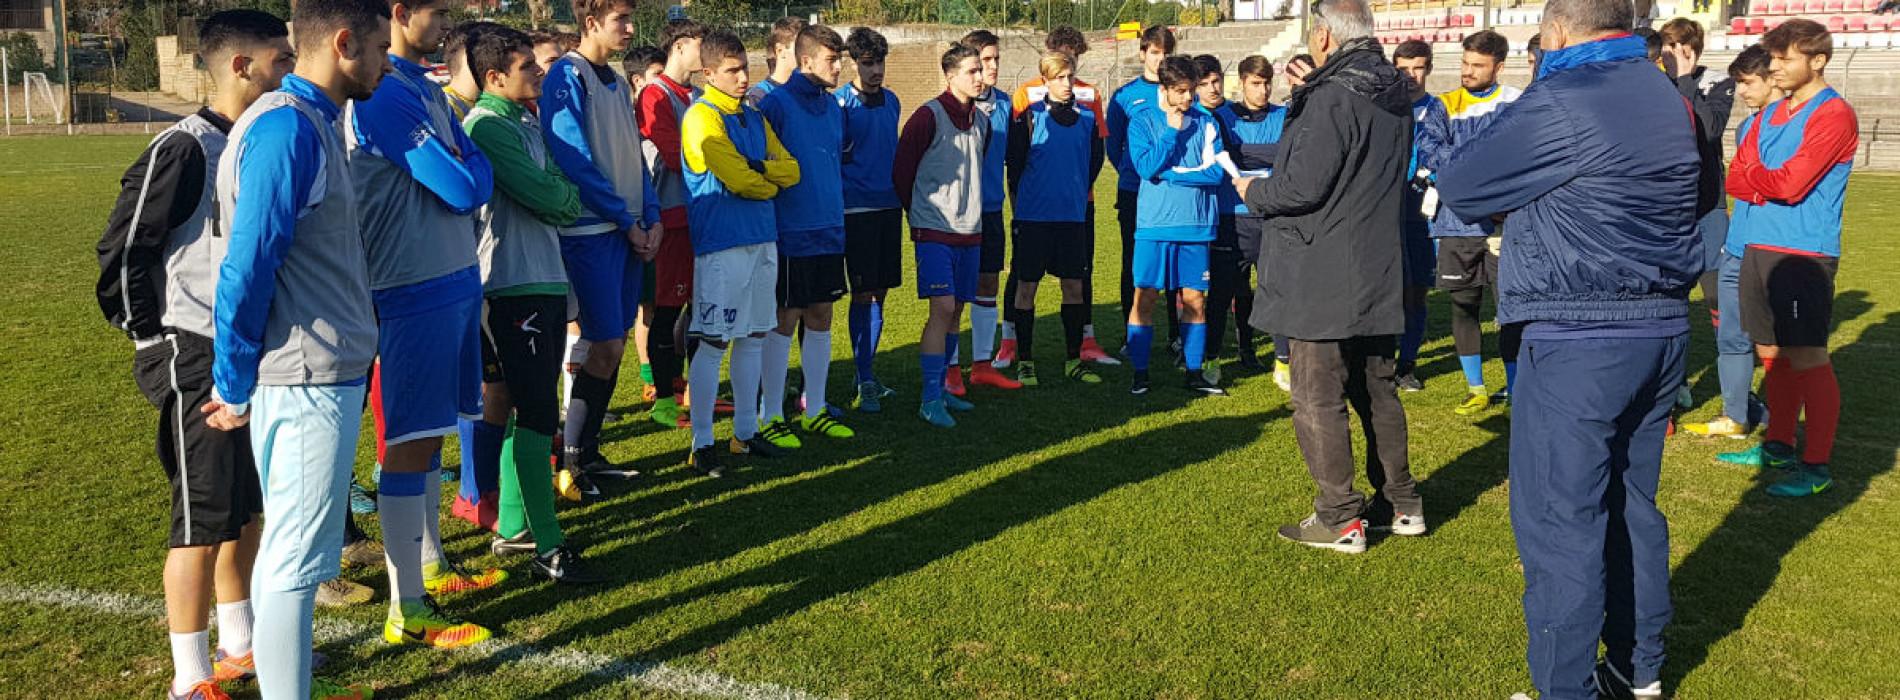 Rapp.ve Nazionali U17 e U18 Lnd, convocazioni per Lavano e Sciretta